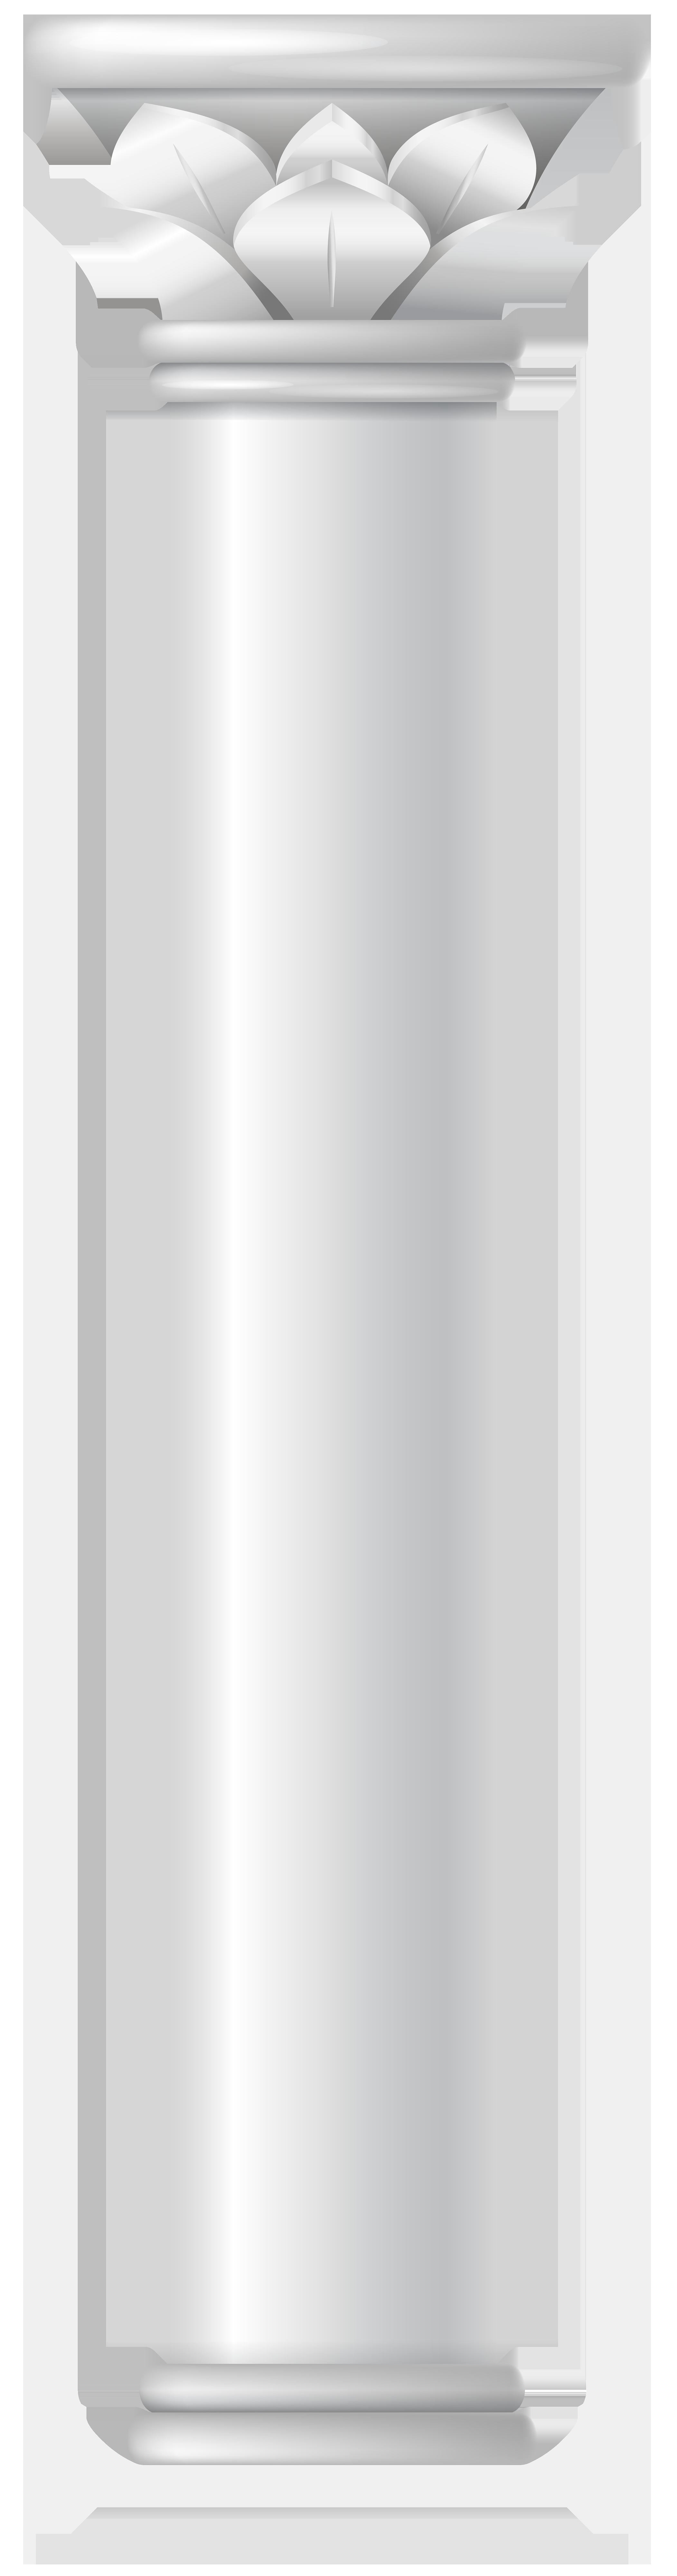 Angle cylinder png transparent. Clipart castle pillar